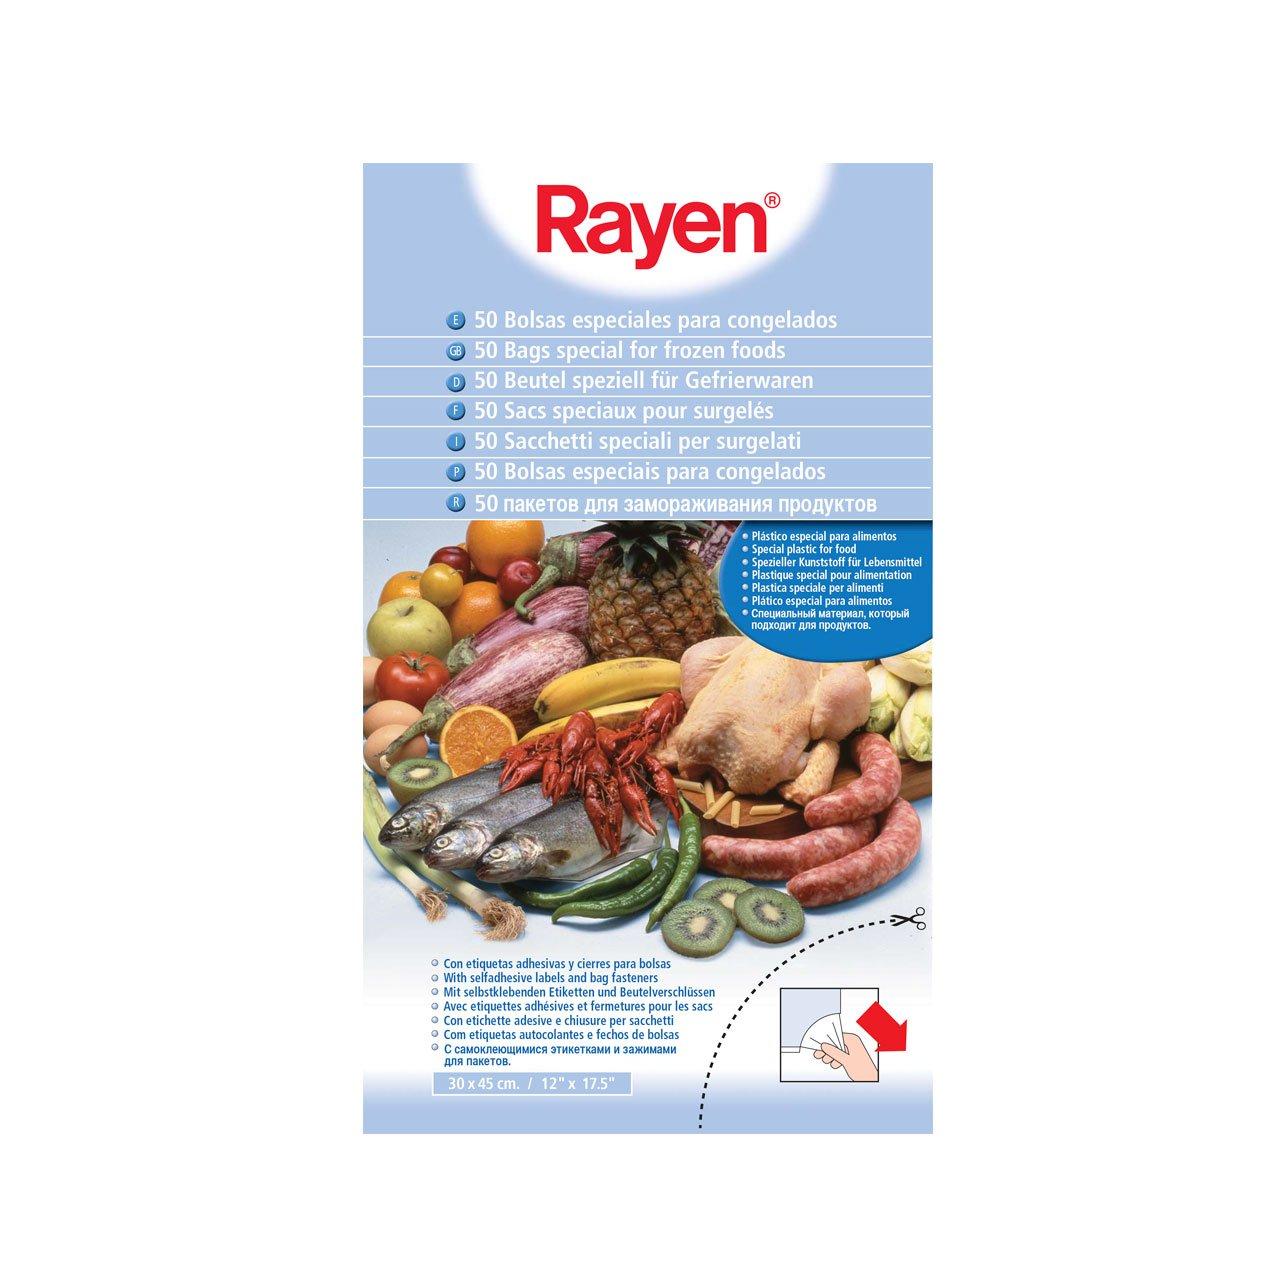 Rayen 6013 50 Bolsas para congelados, Centimeters